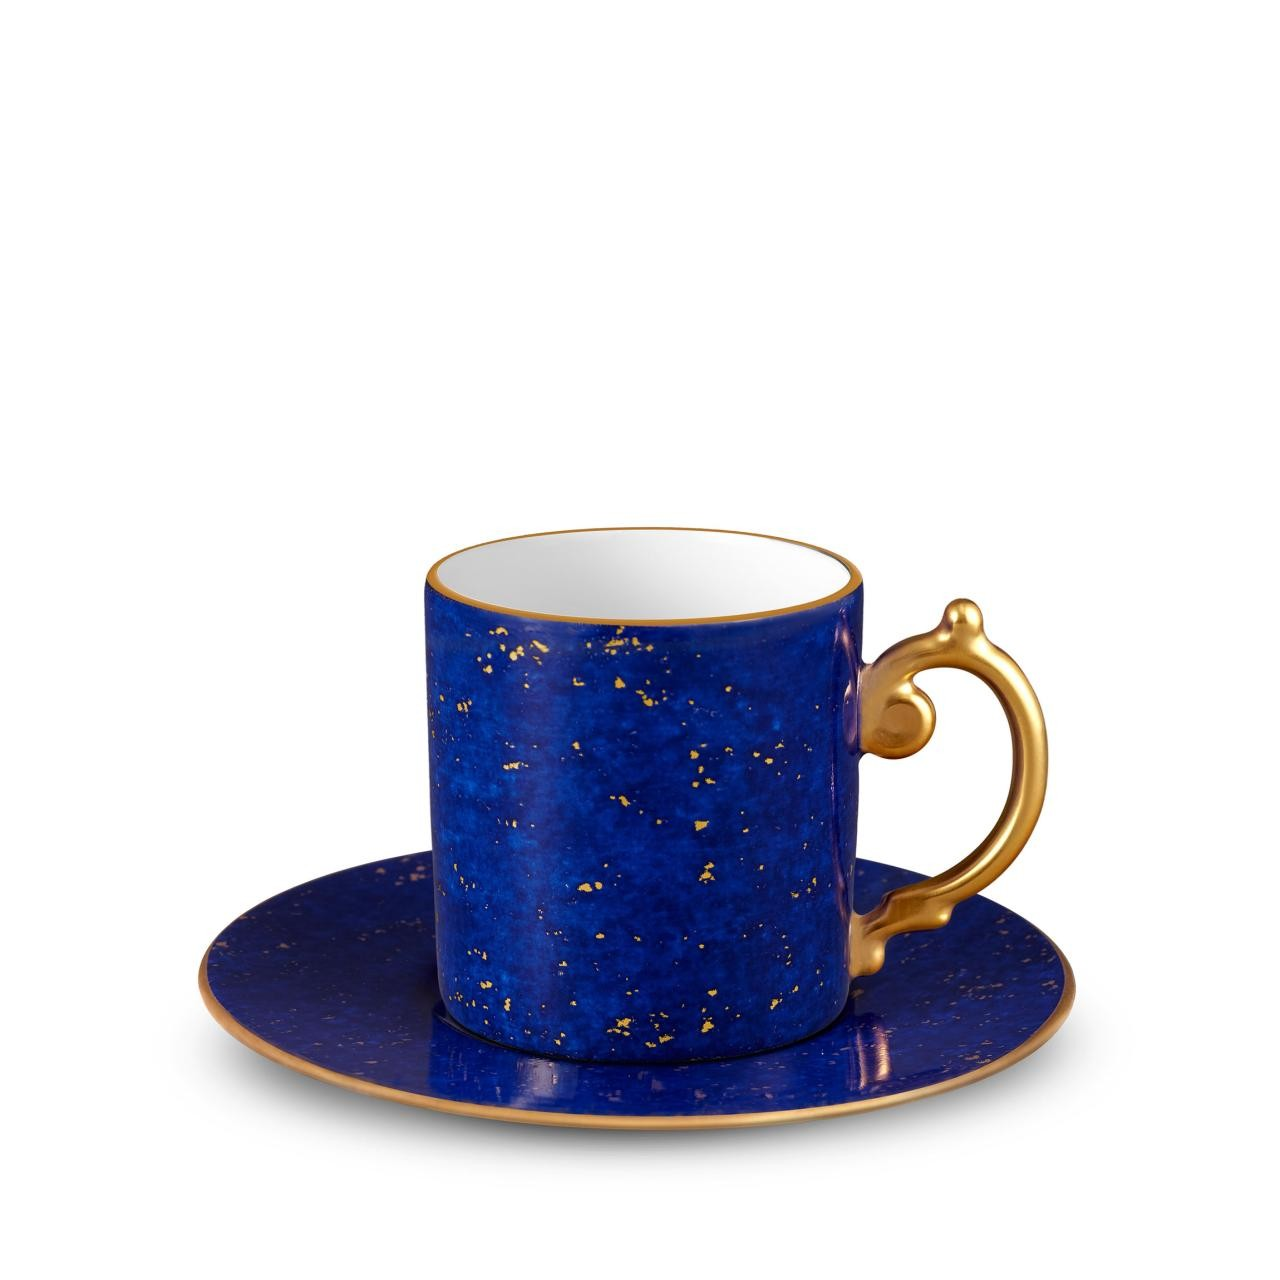 L'Objet I Lapis Espresso Cup + Saucer